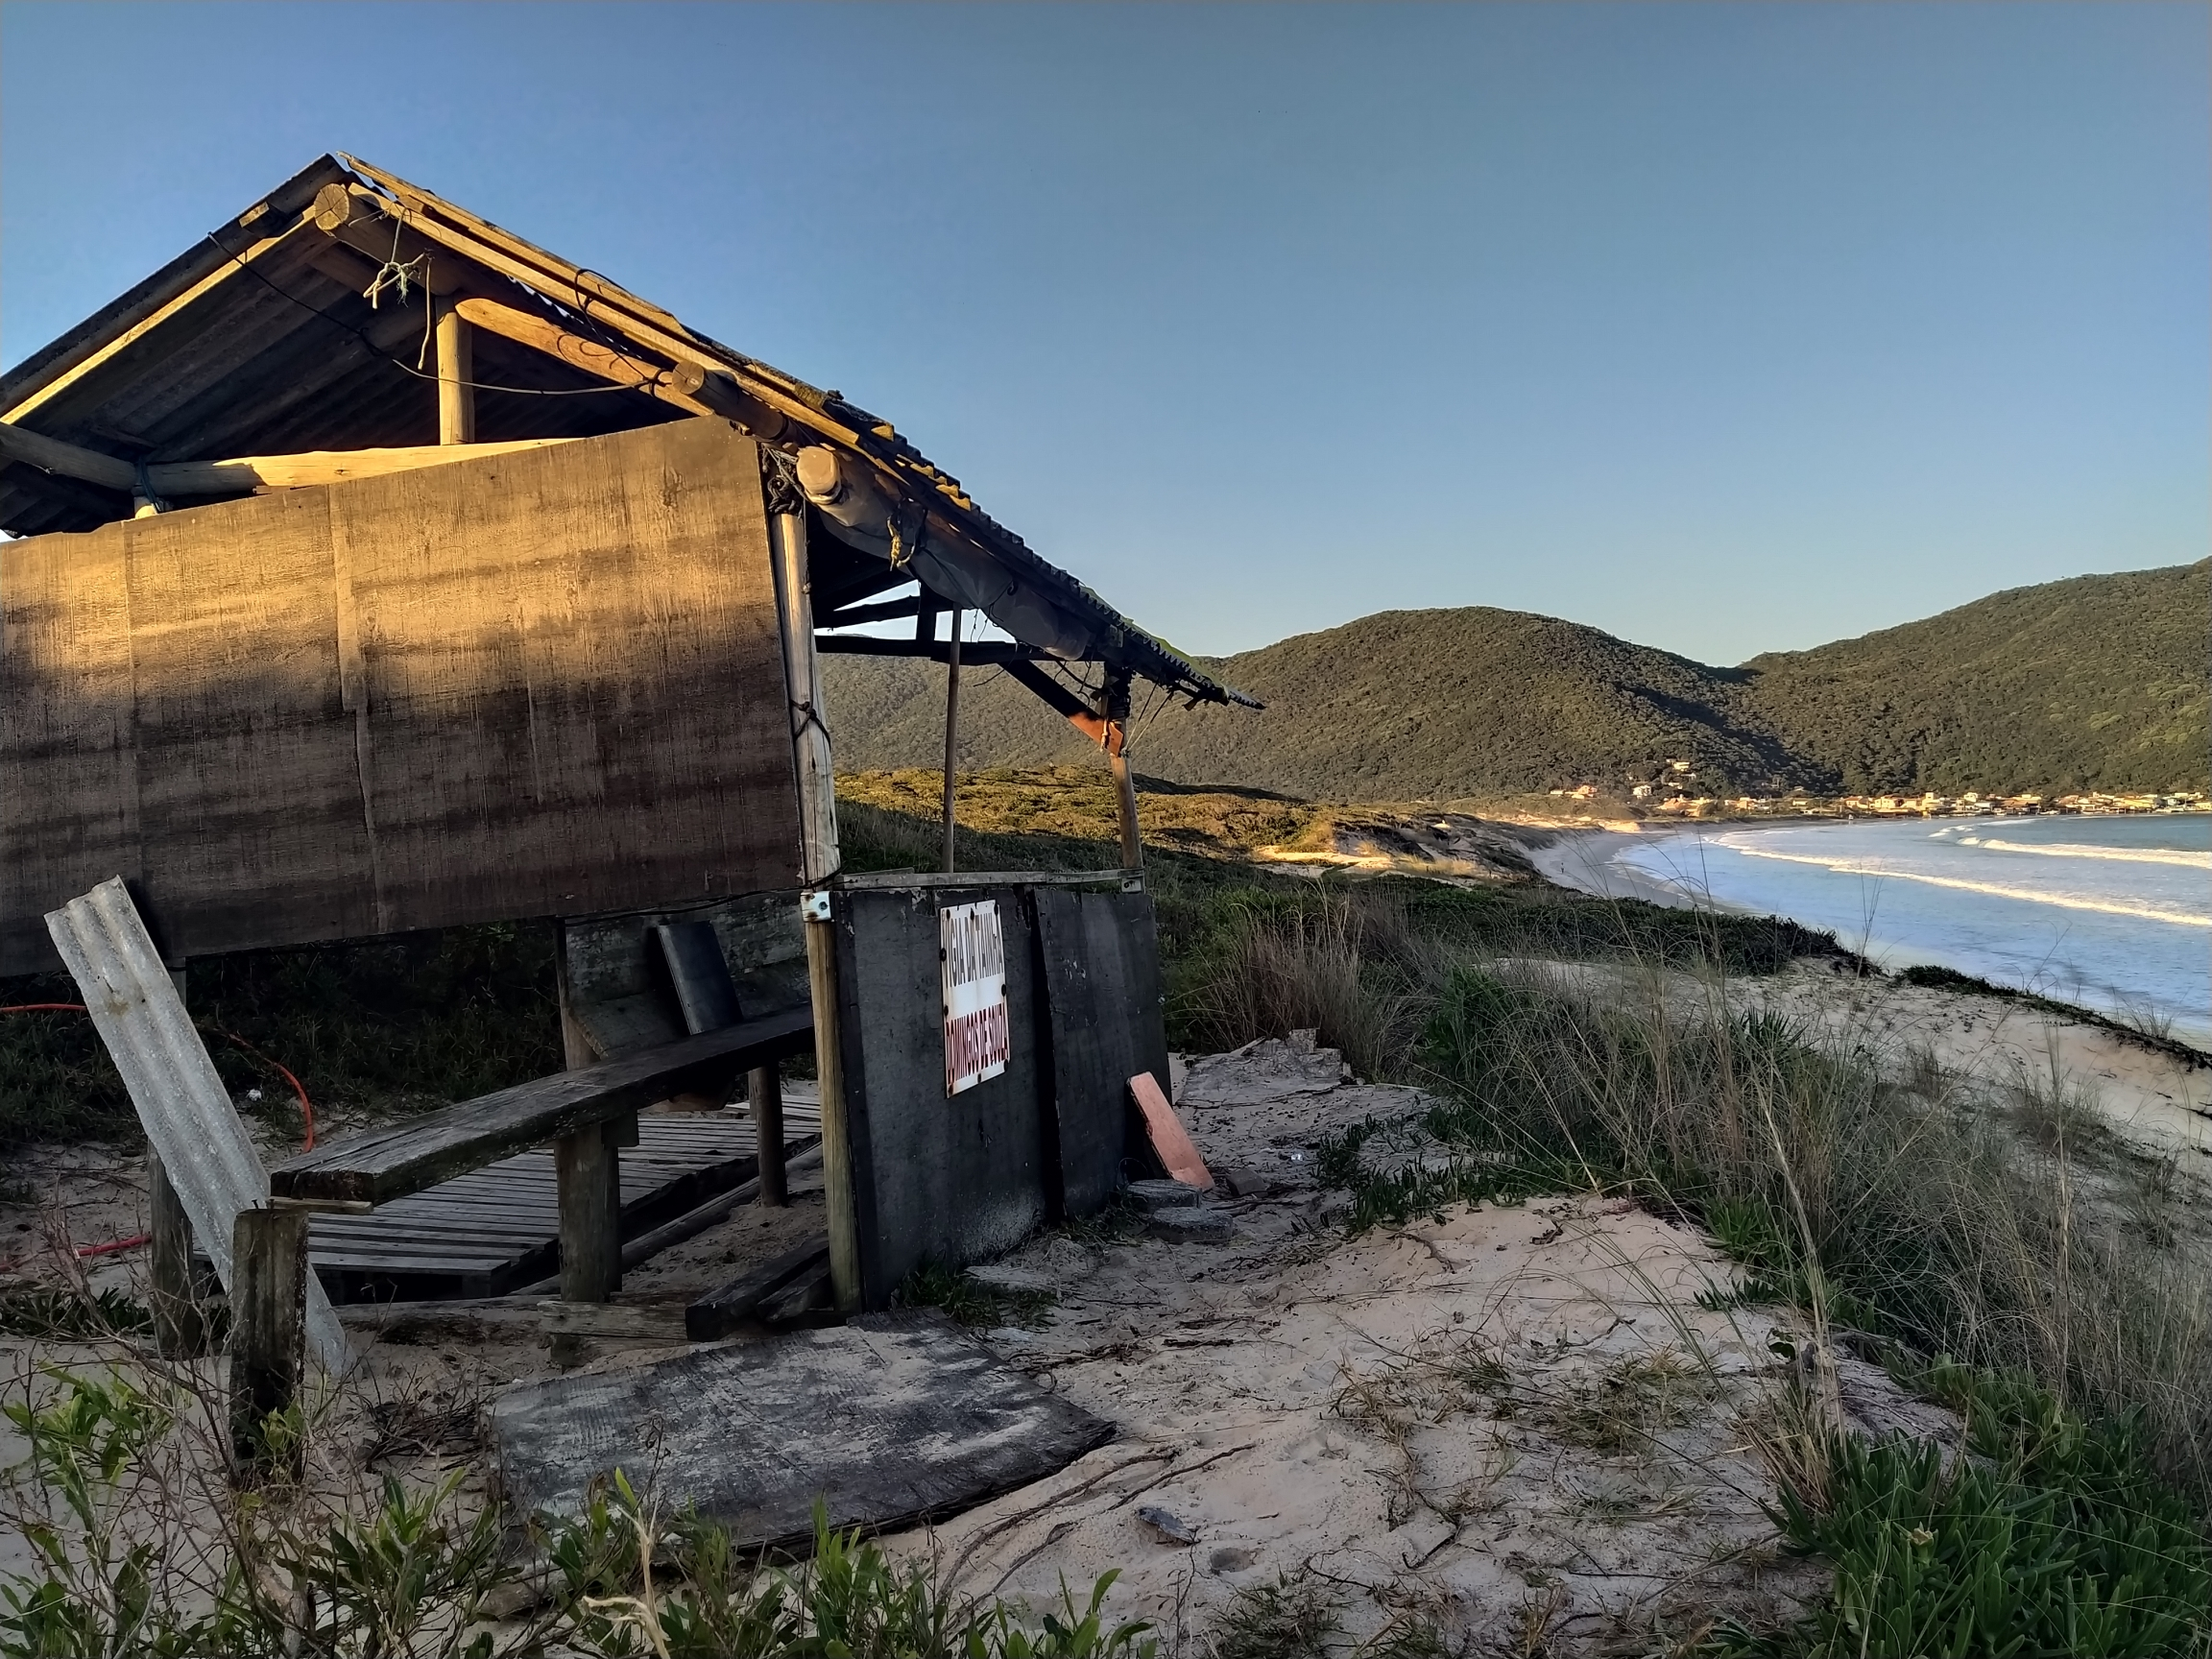 A small fishers' hut in  Pantano do Sul.